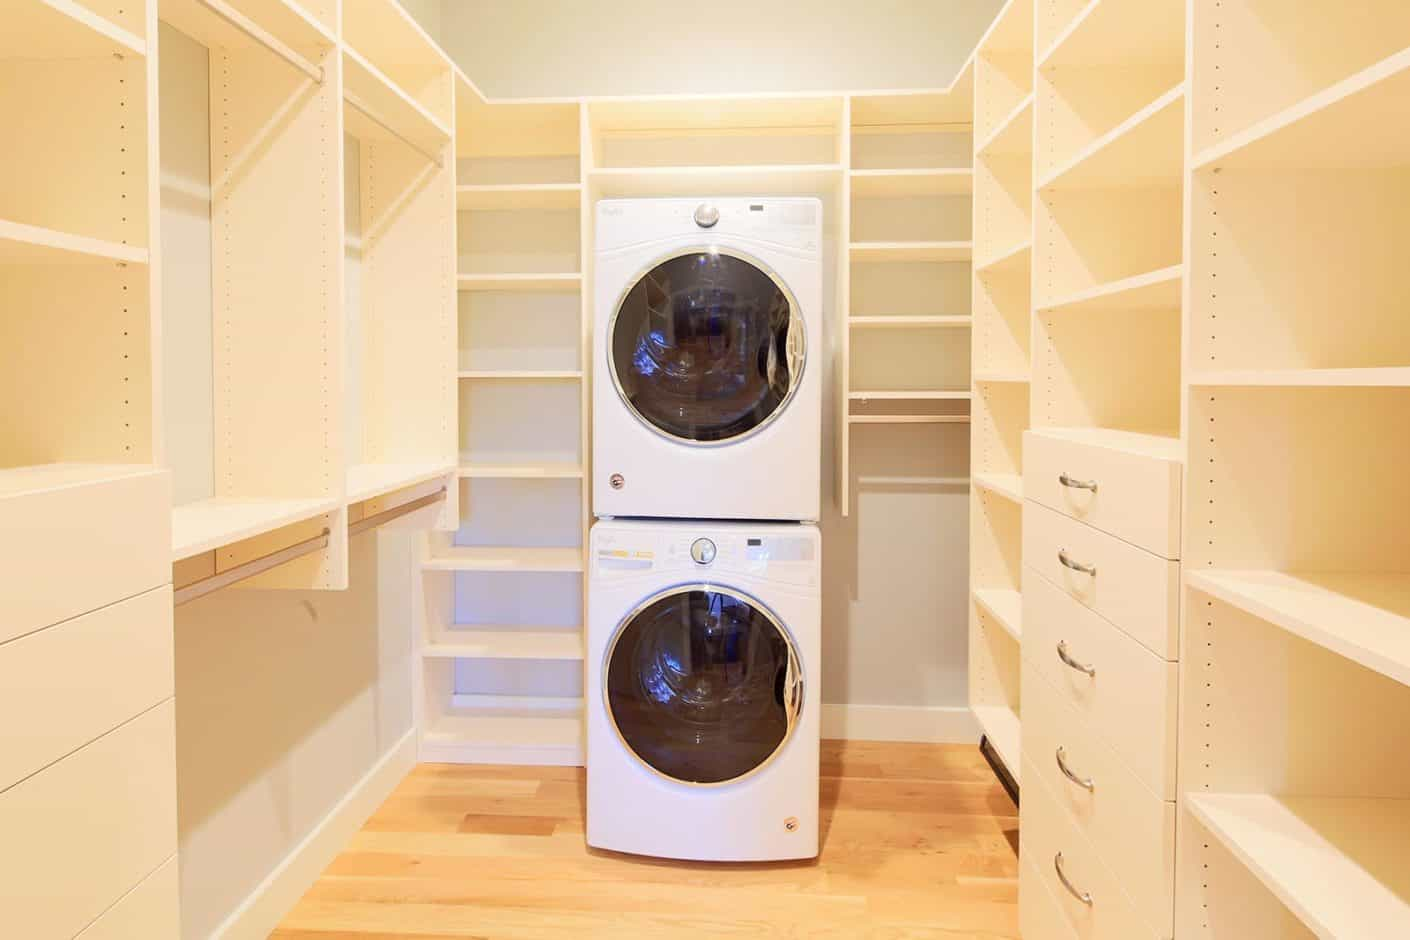 Laundry Room - Linen